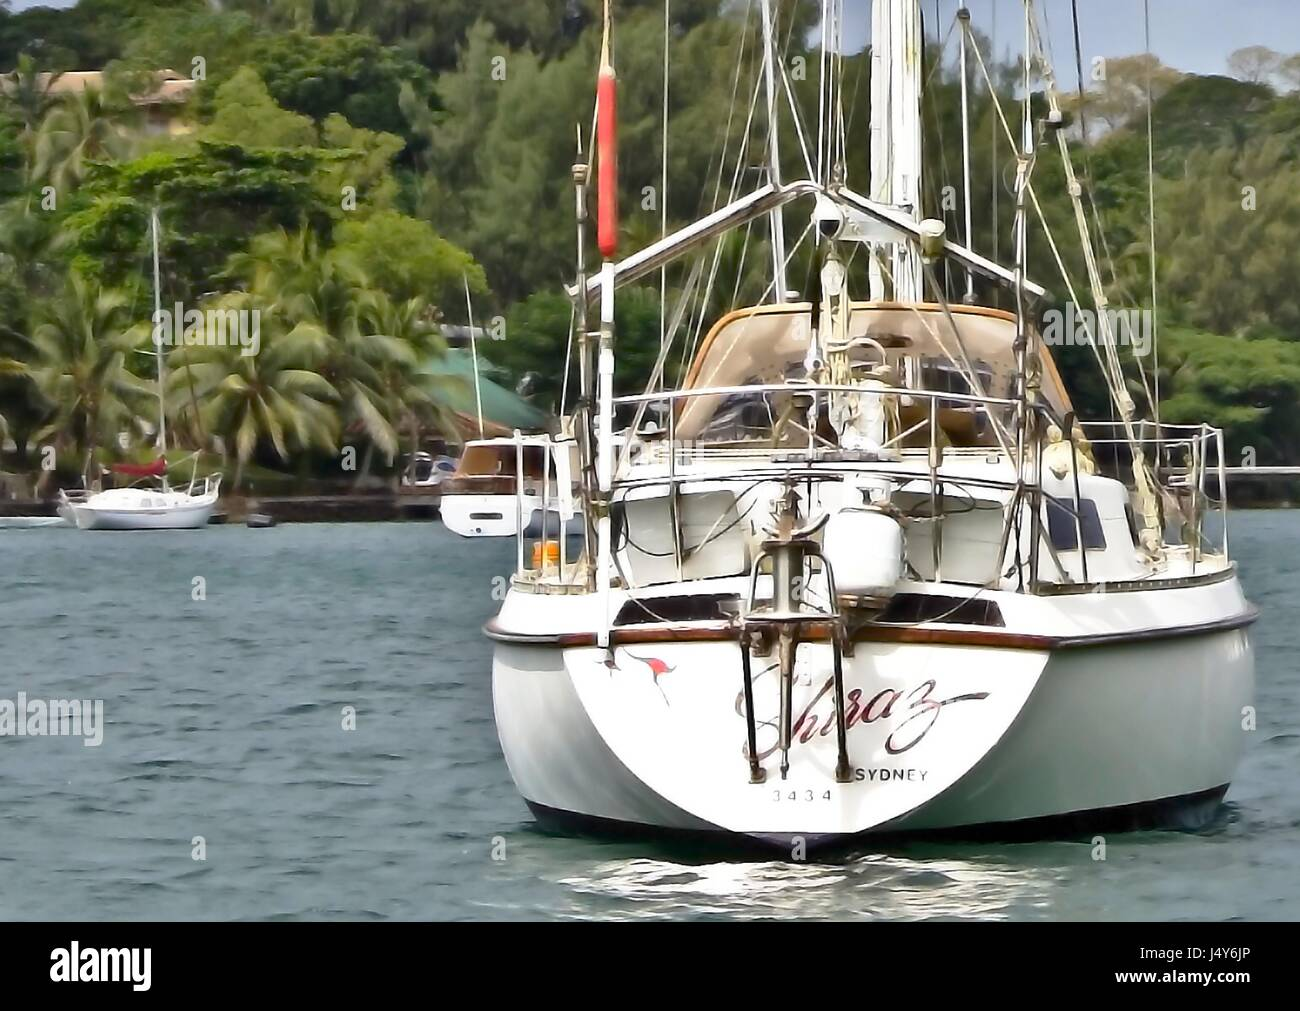 Close-up of yacht moored in Port Vila, Efate Island, Vanuatu - Stock Image